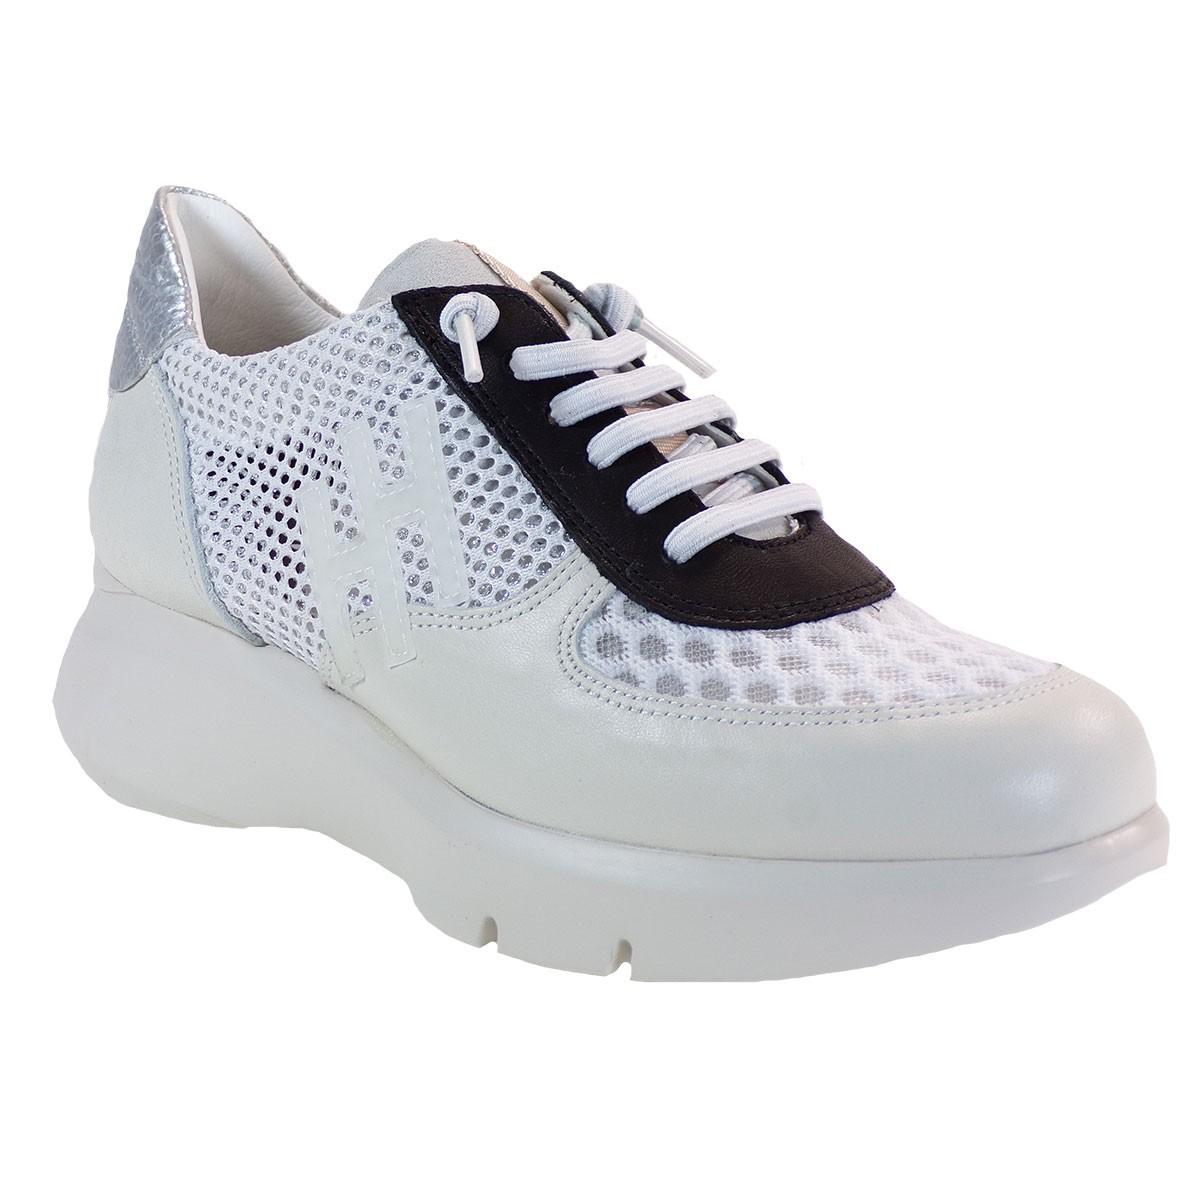 Hispanitas Γυναικεία Sneakers Αθλητικό HV00228 Λευκό Δέρμα